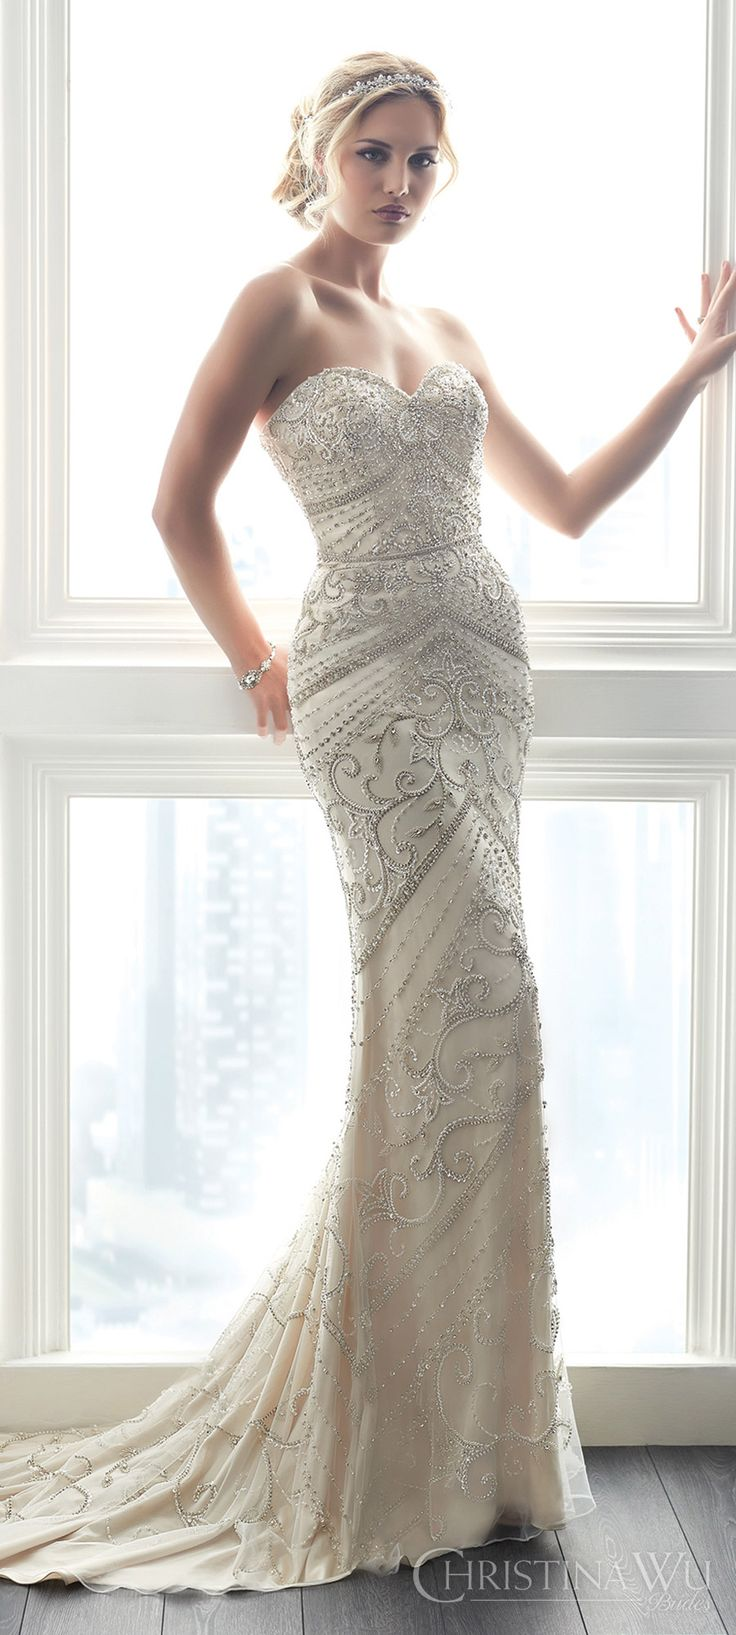 Best 25+ Beaded wedding dresses ideas on Pinterest ...